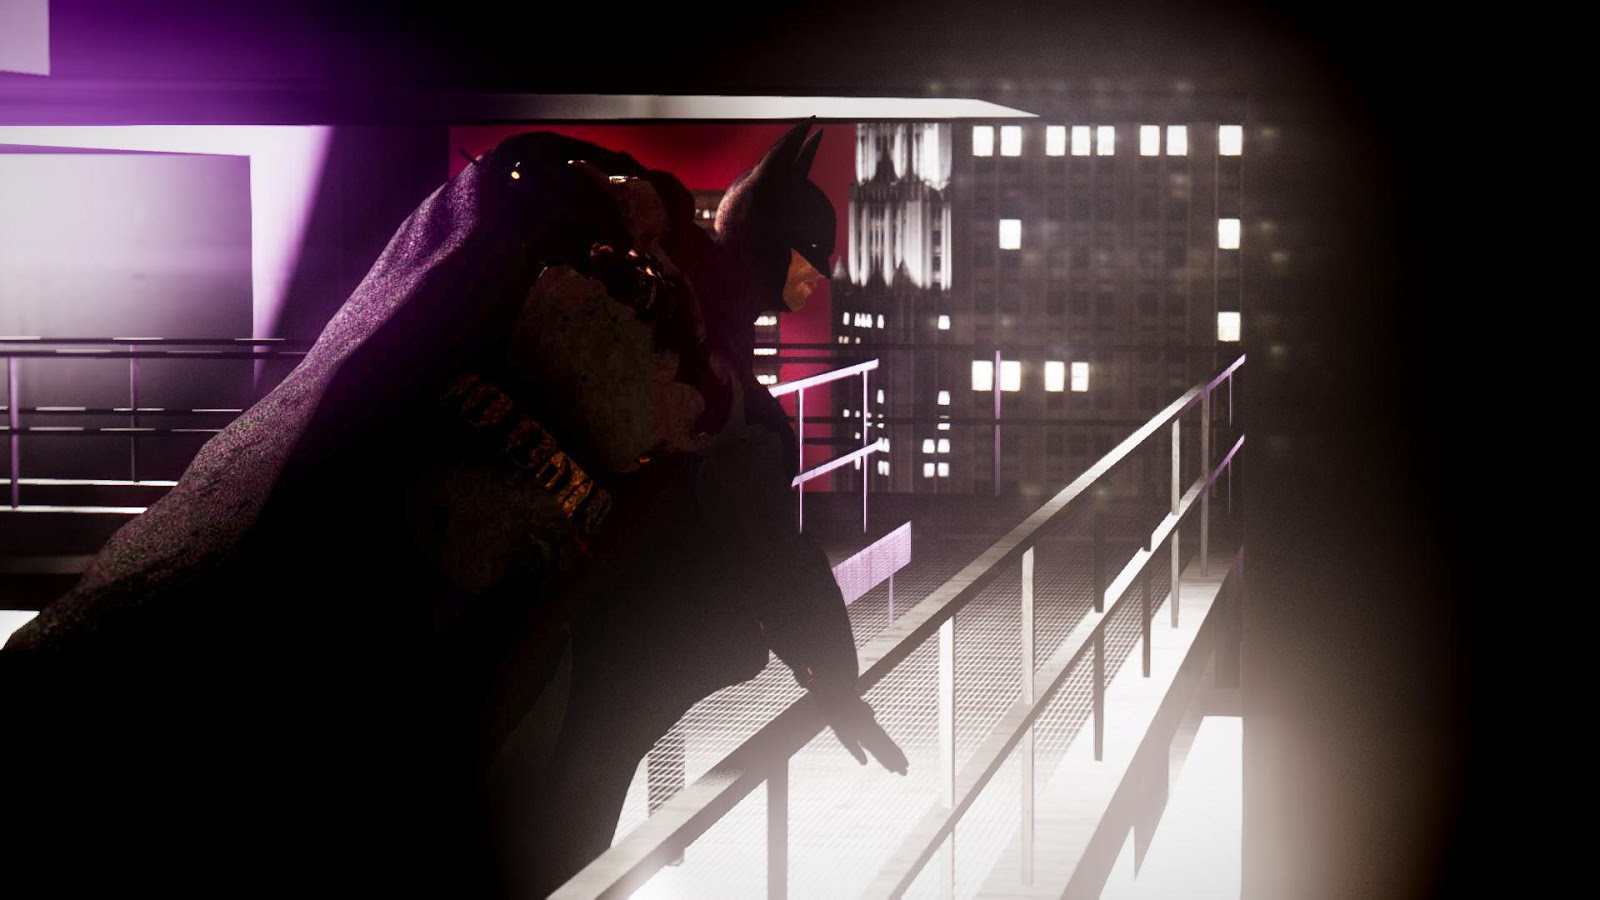 GTA 5,GTAV,GTA IV Mods and Skins: GTA MOD :Batman Arkham